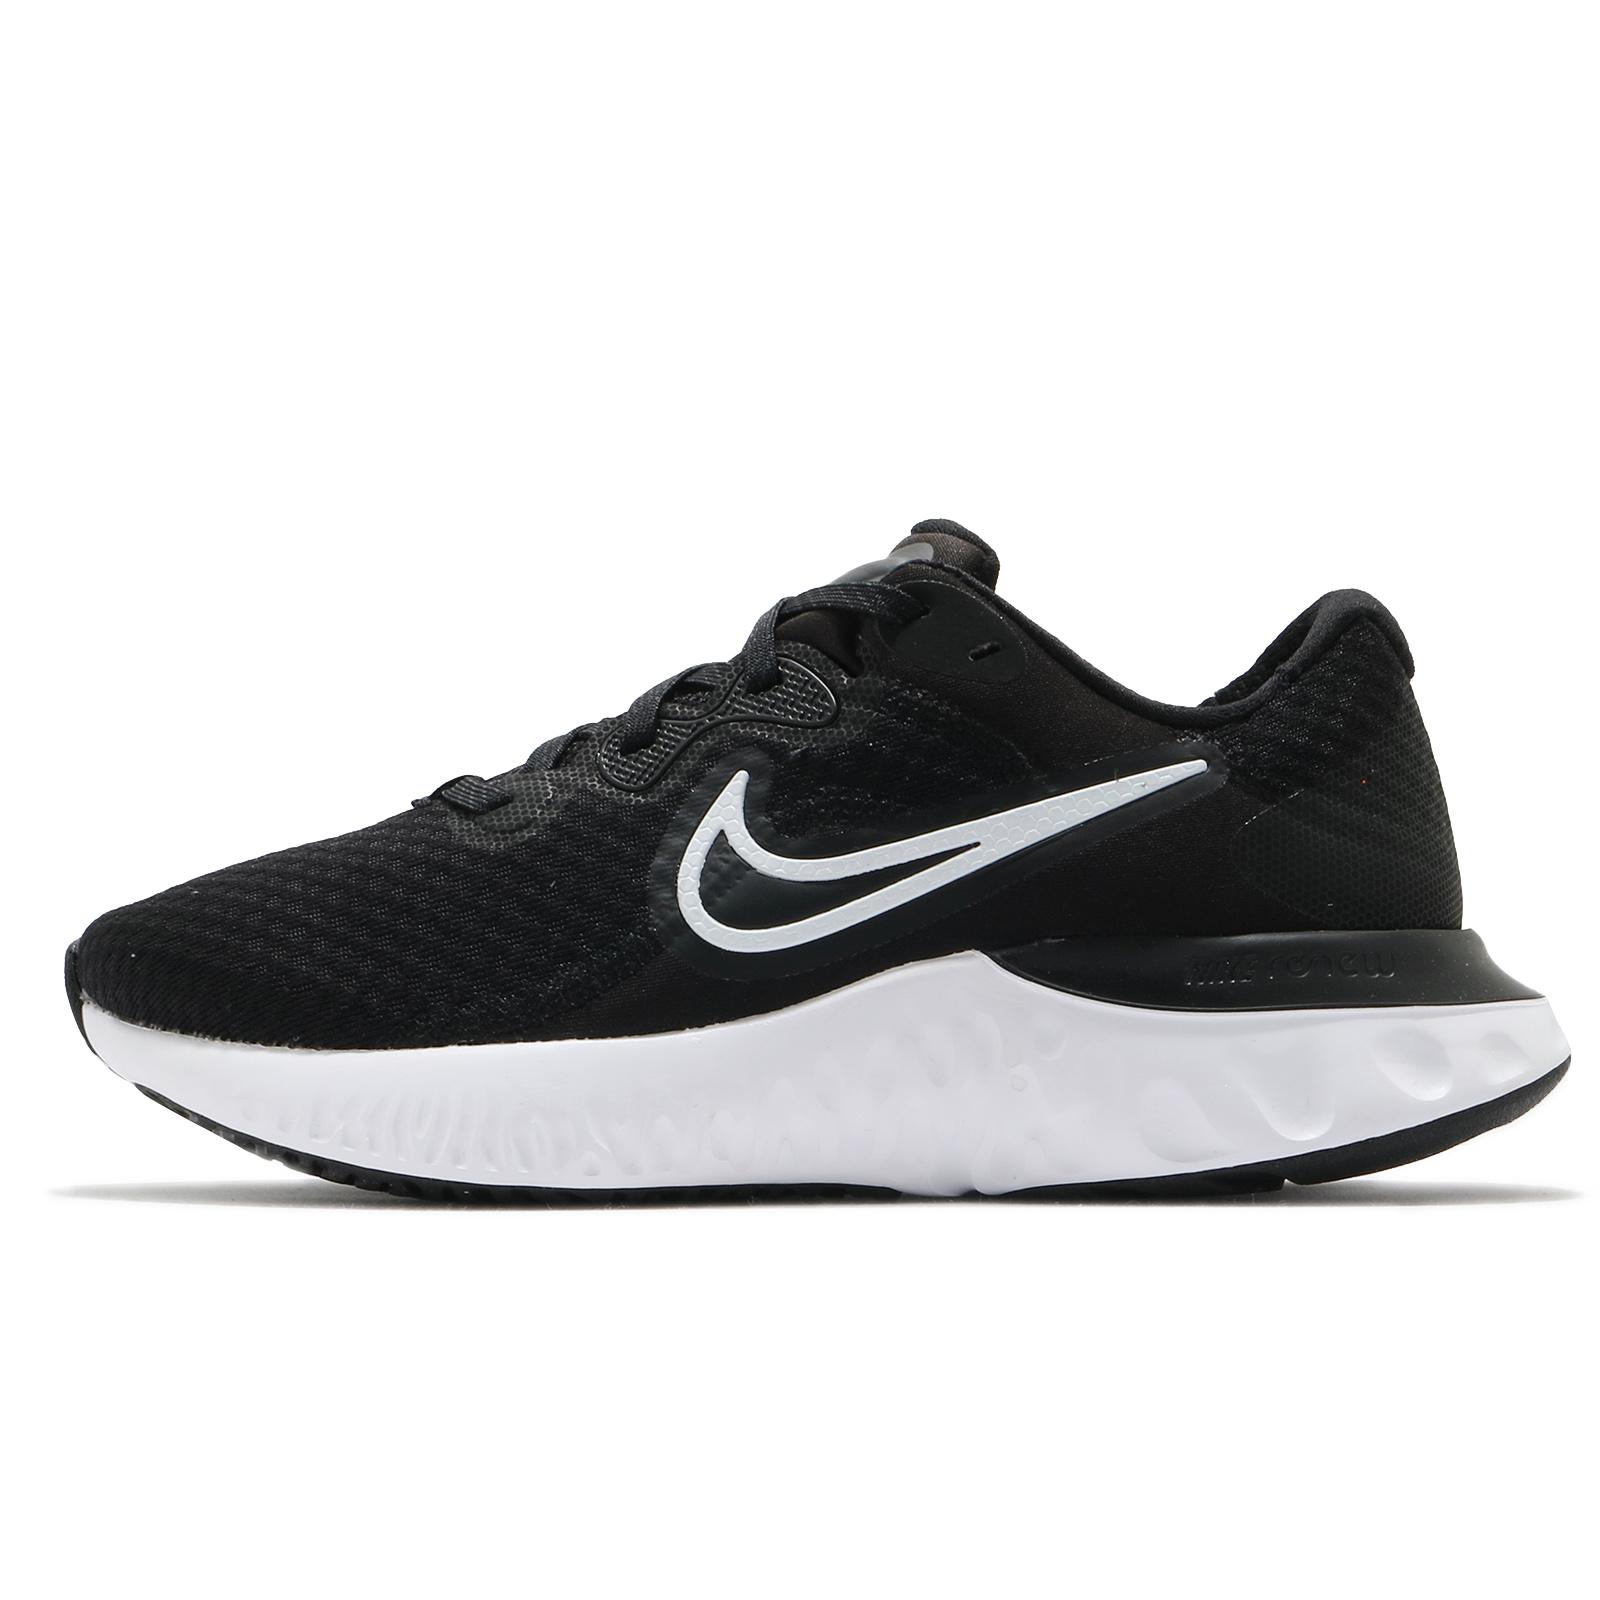 Nike 慢跑鞋 Renew Run 2 黑 白 基本款 運動鞋 女鞋 發泡中底【ACS】 CU3505-005